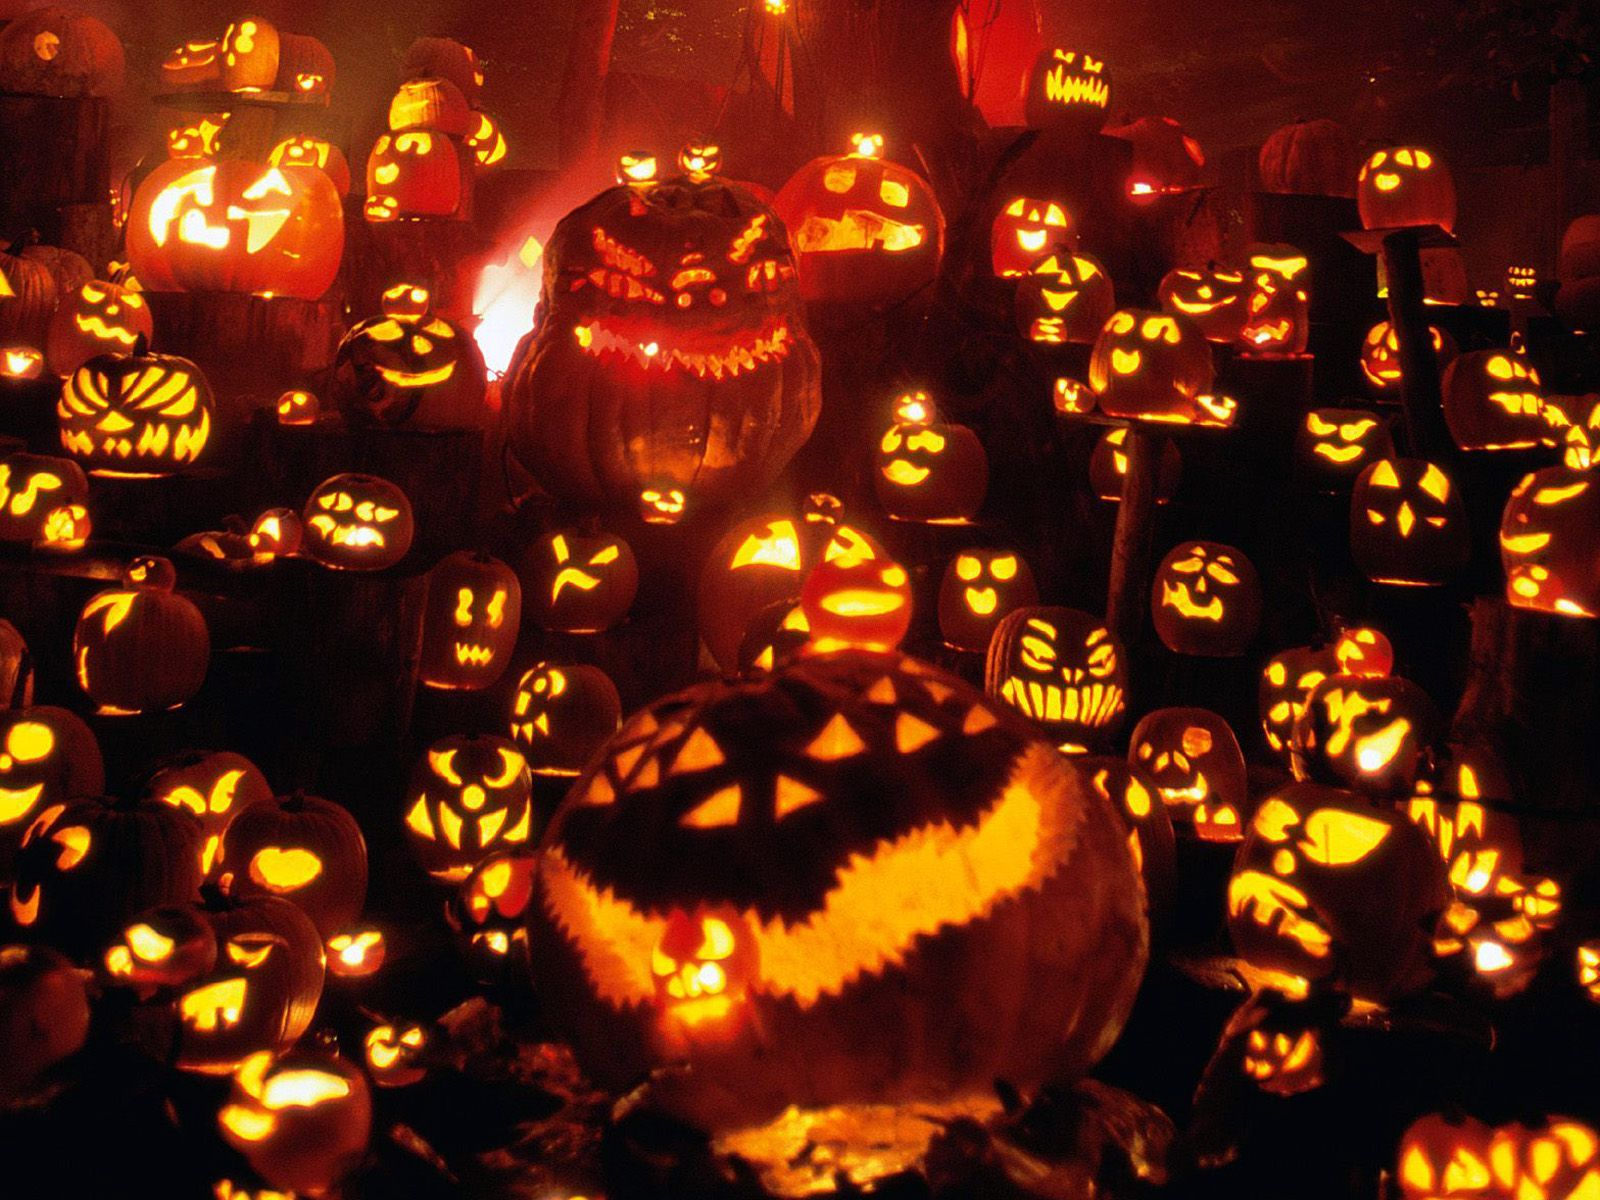 Image Detail For Pumpkins To Halloween Desktop Wallpapers Free On Latoro Com Jack O Lantern Halloween Pumpkins Diy Halloween Decorations